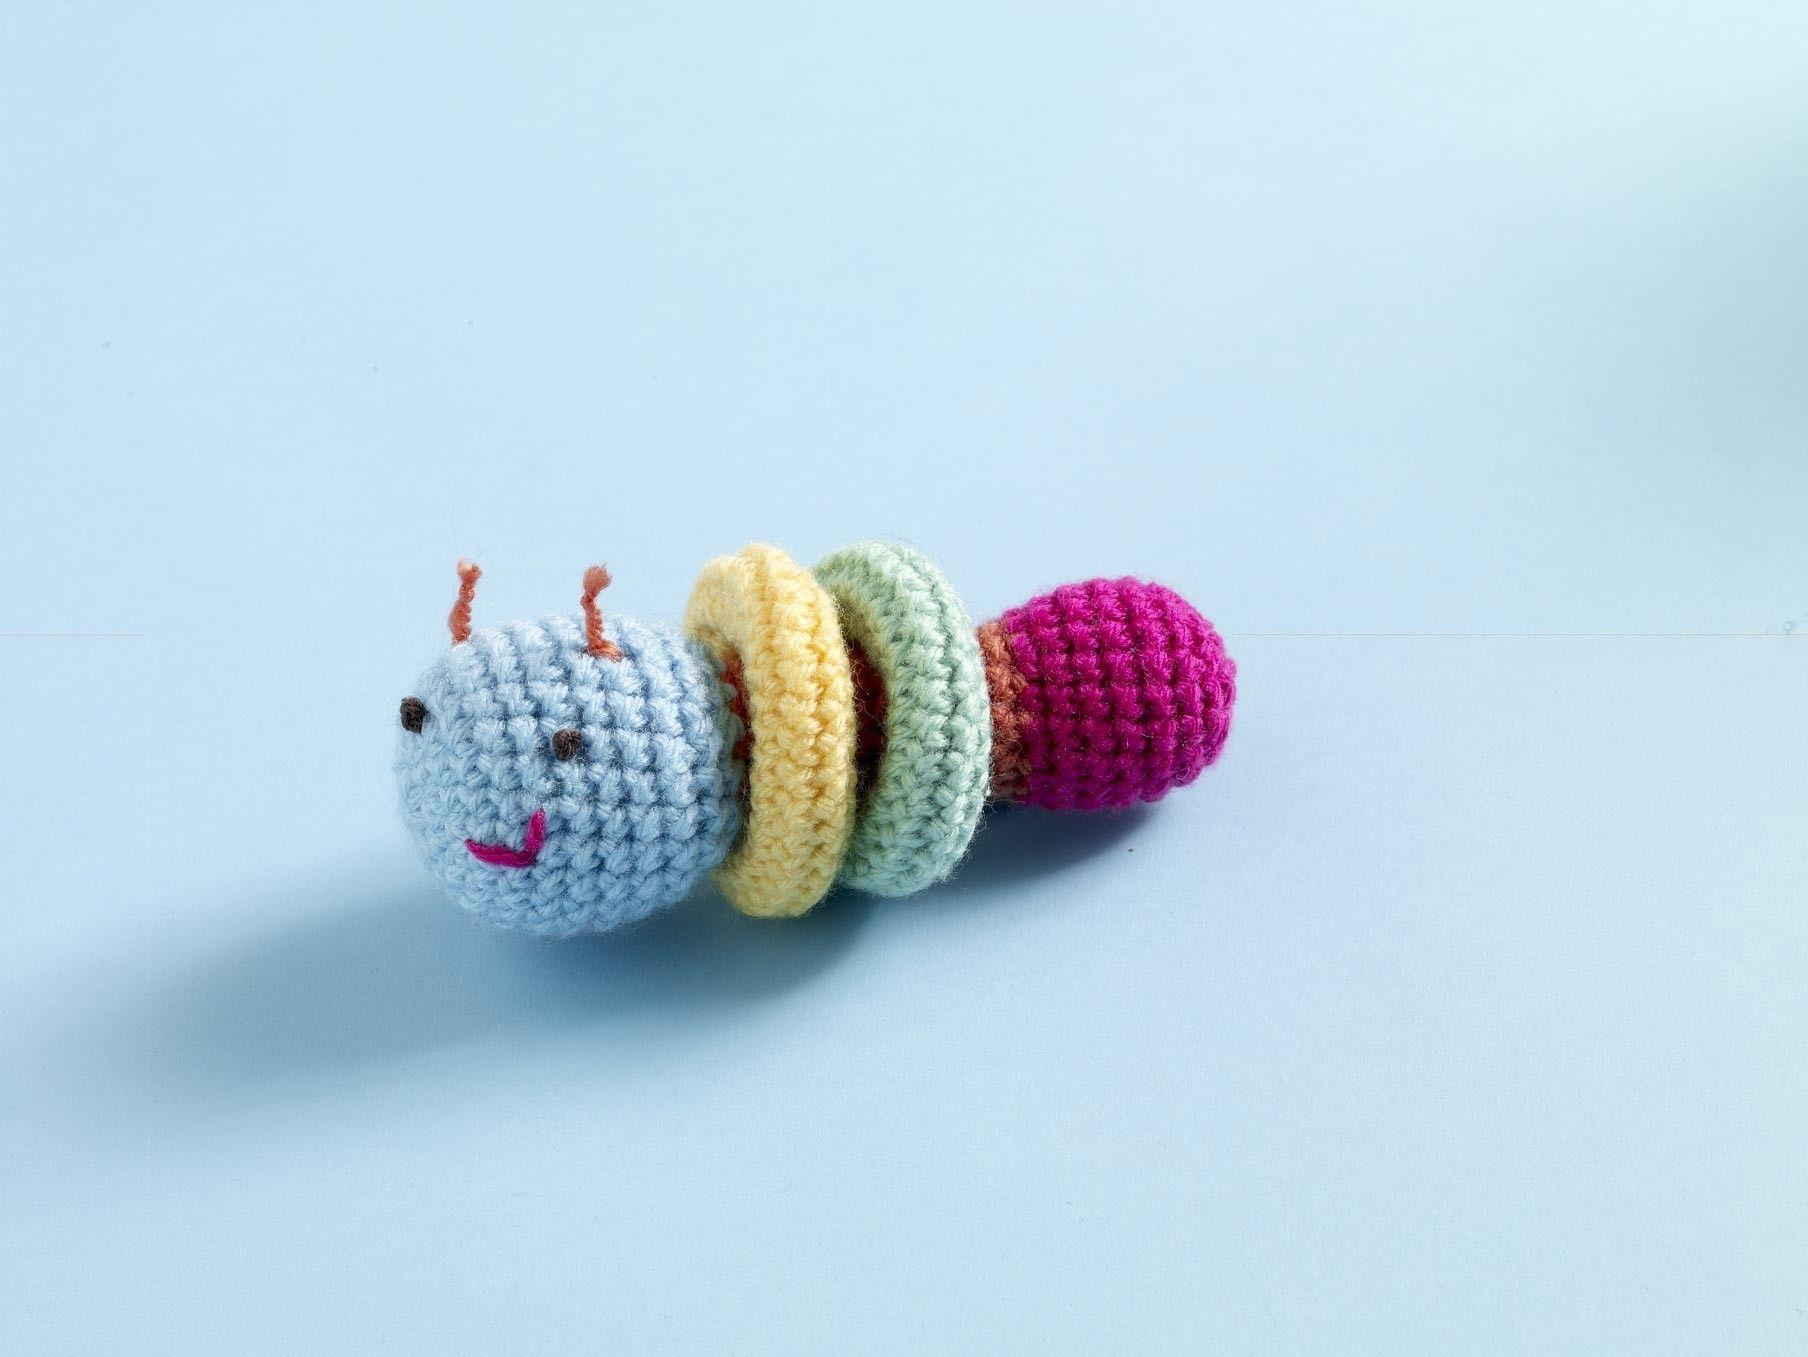 Caterpillar Baby Toy Pattern (Crochet) | babyspielzeug | Pinterest ...